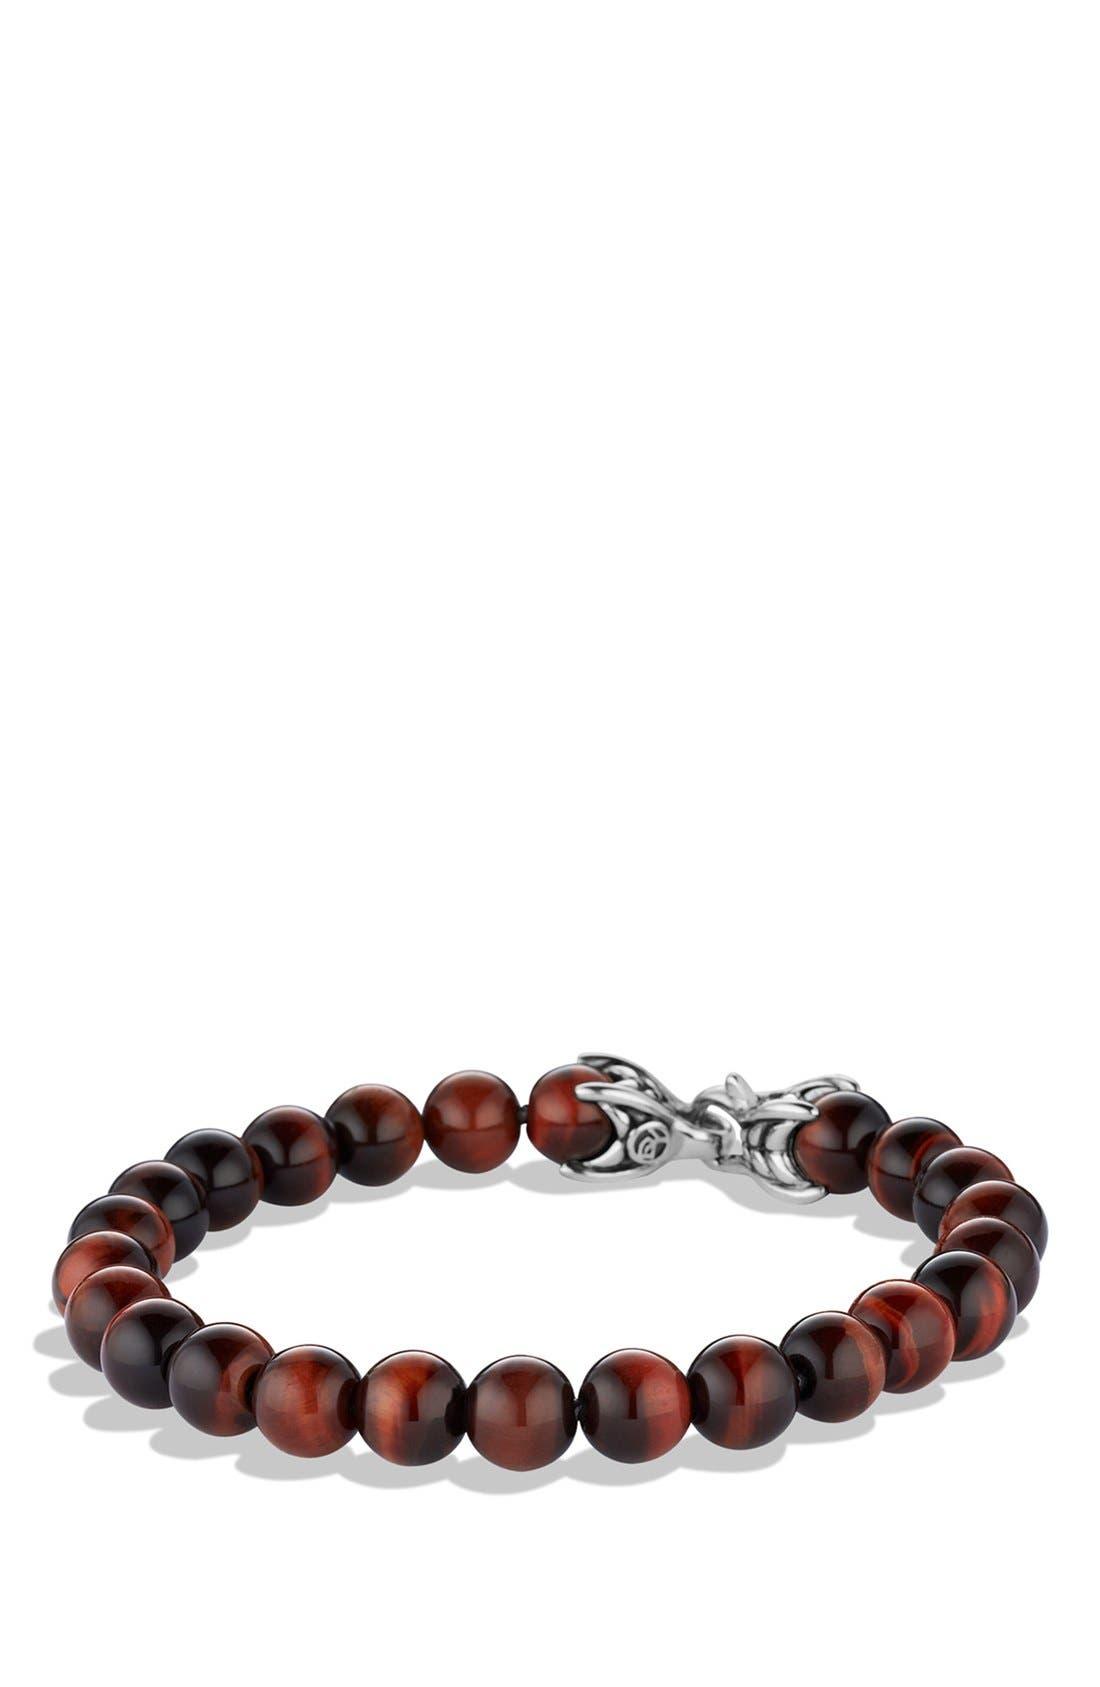 DAVID YURMAN 'Spiritual Beads' Bracelet with Tiger's Eye, Main, color, TIGER EYE